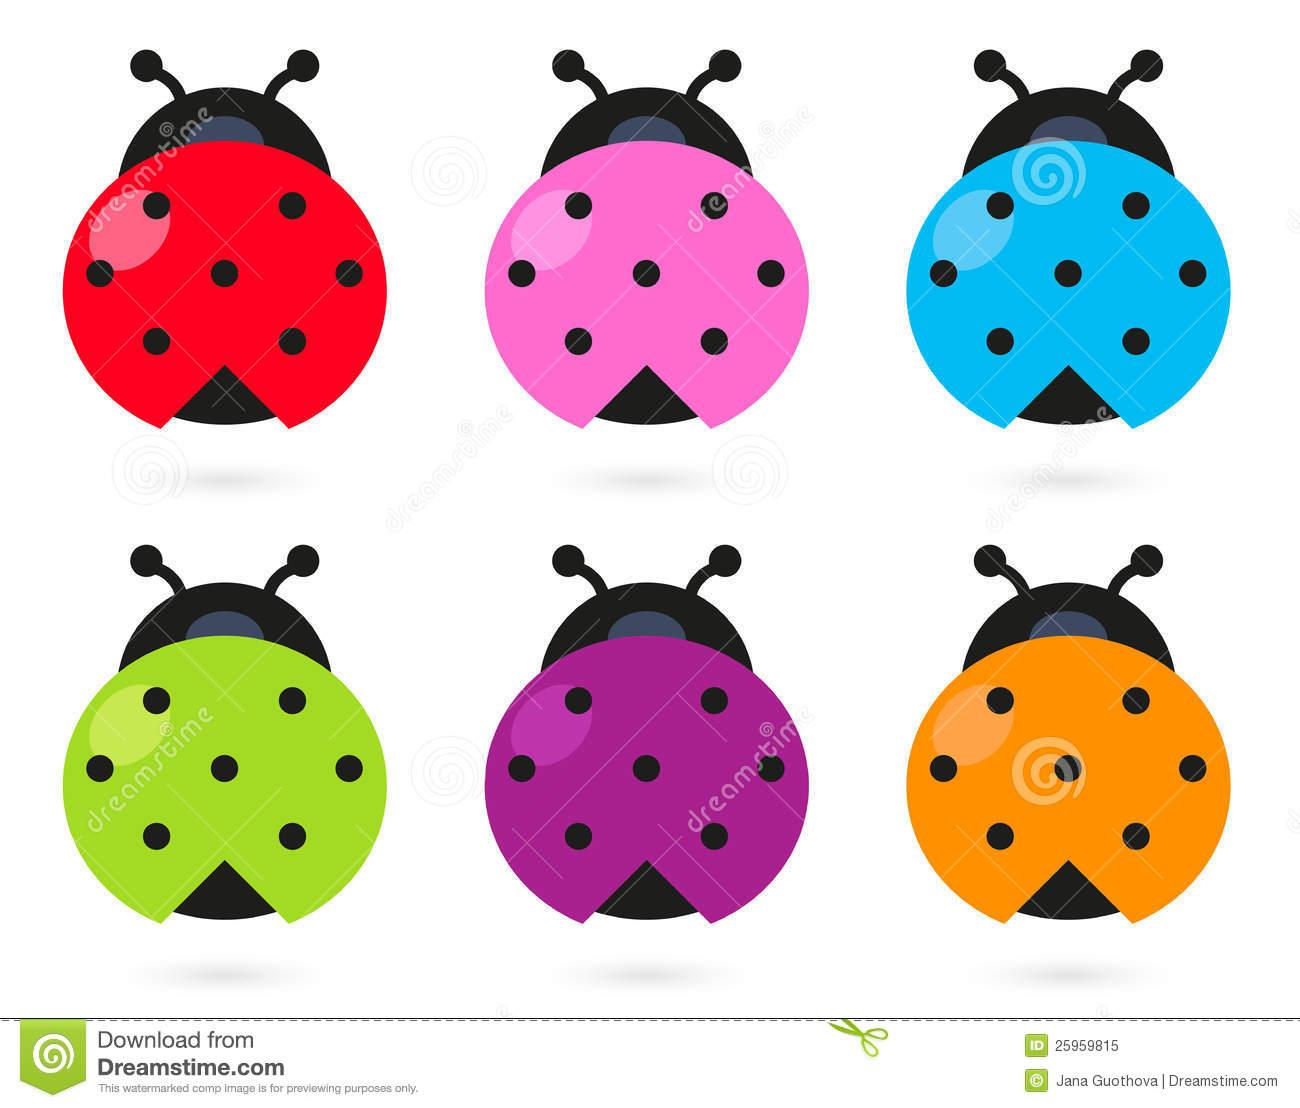 cute ladybug drawings clipart panda free clipart images rh clipartpanda com Cute Butterfly Clip Art cute ladybug clipart free